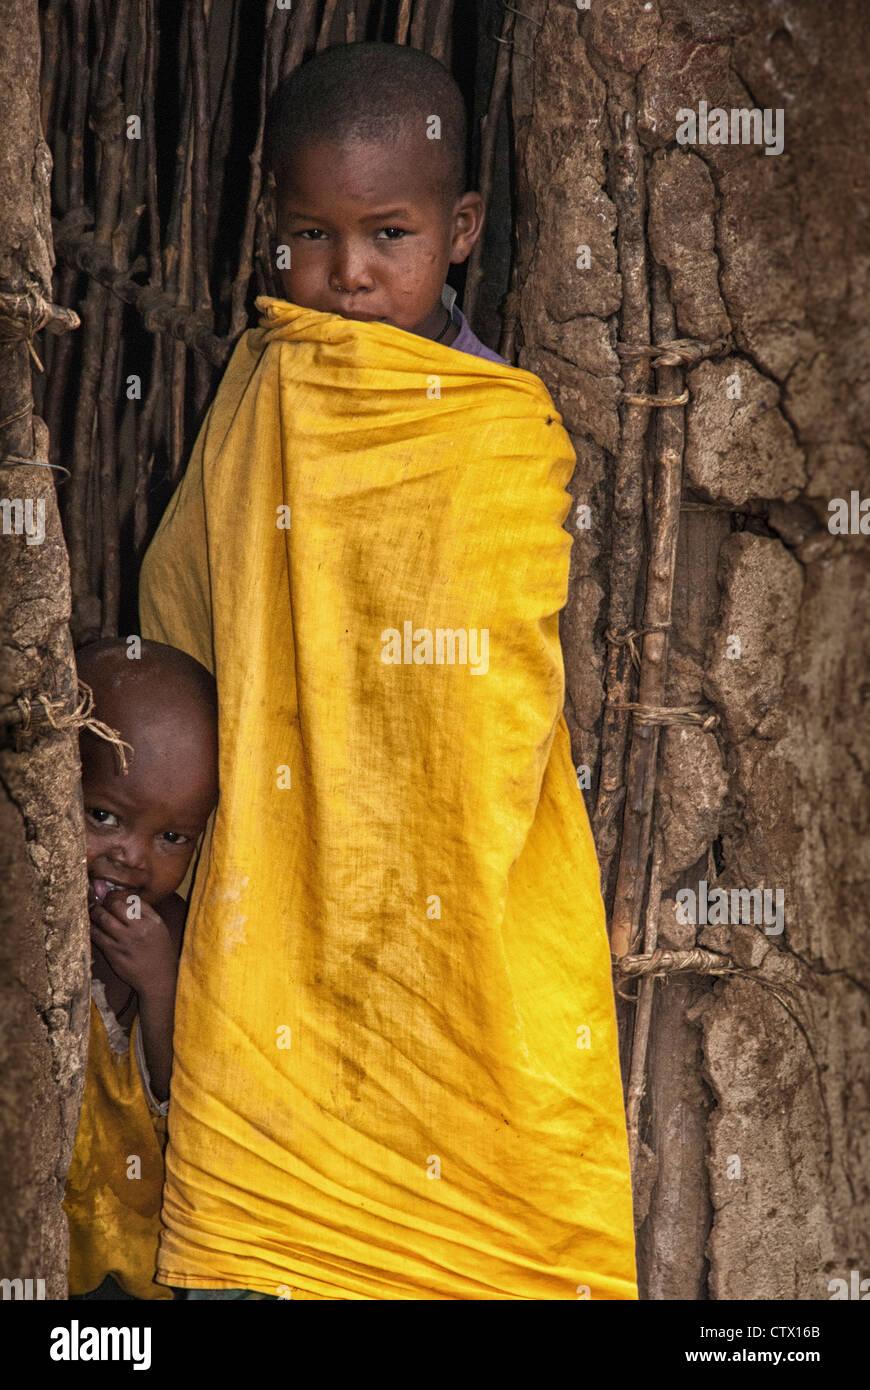 Masai Child in the doorway of a mud hut in a village near the Masai Mara, Kenya, East Africa Stock Photo